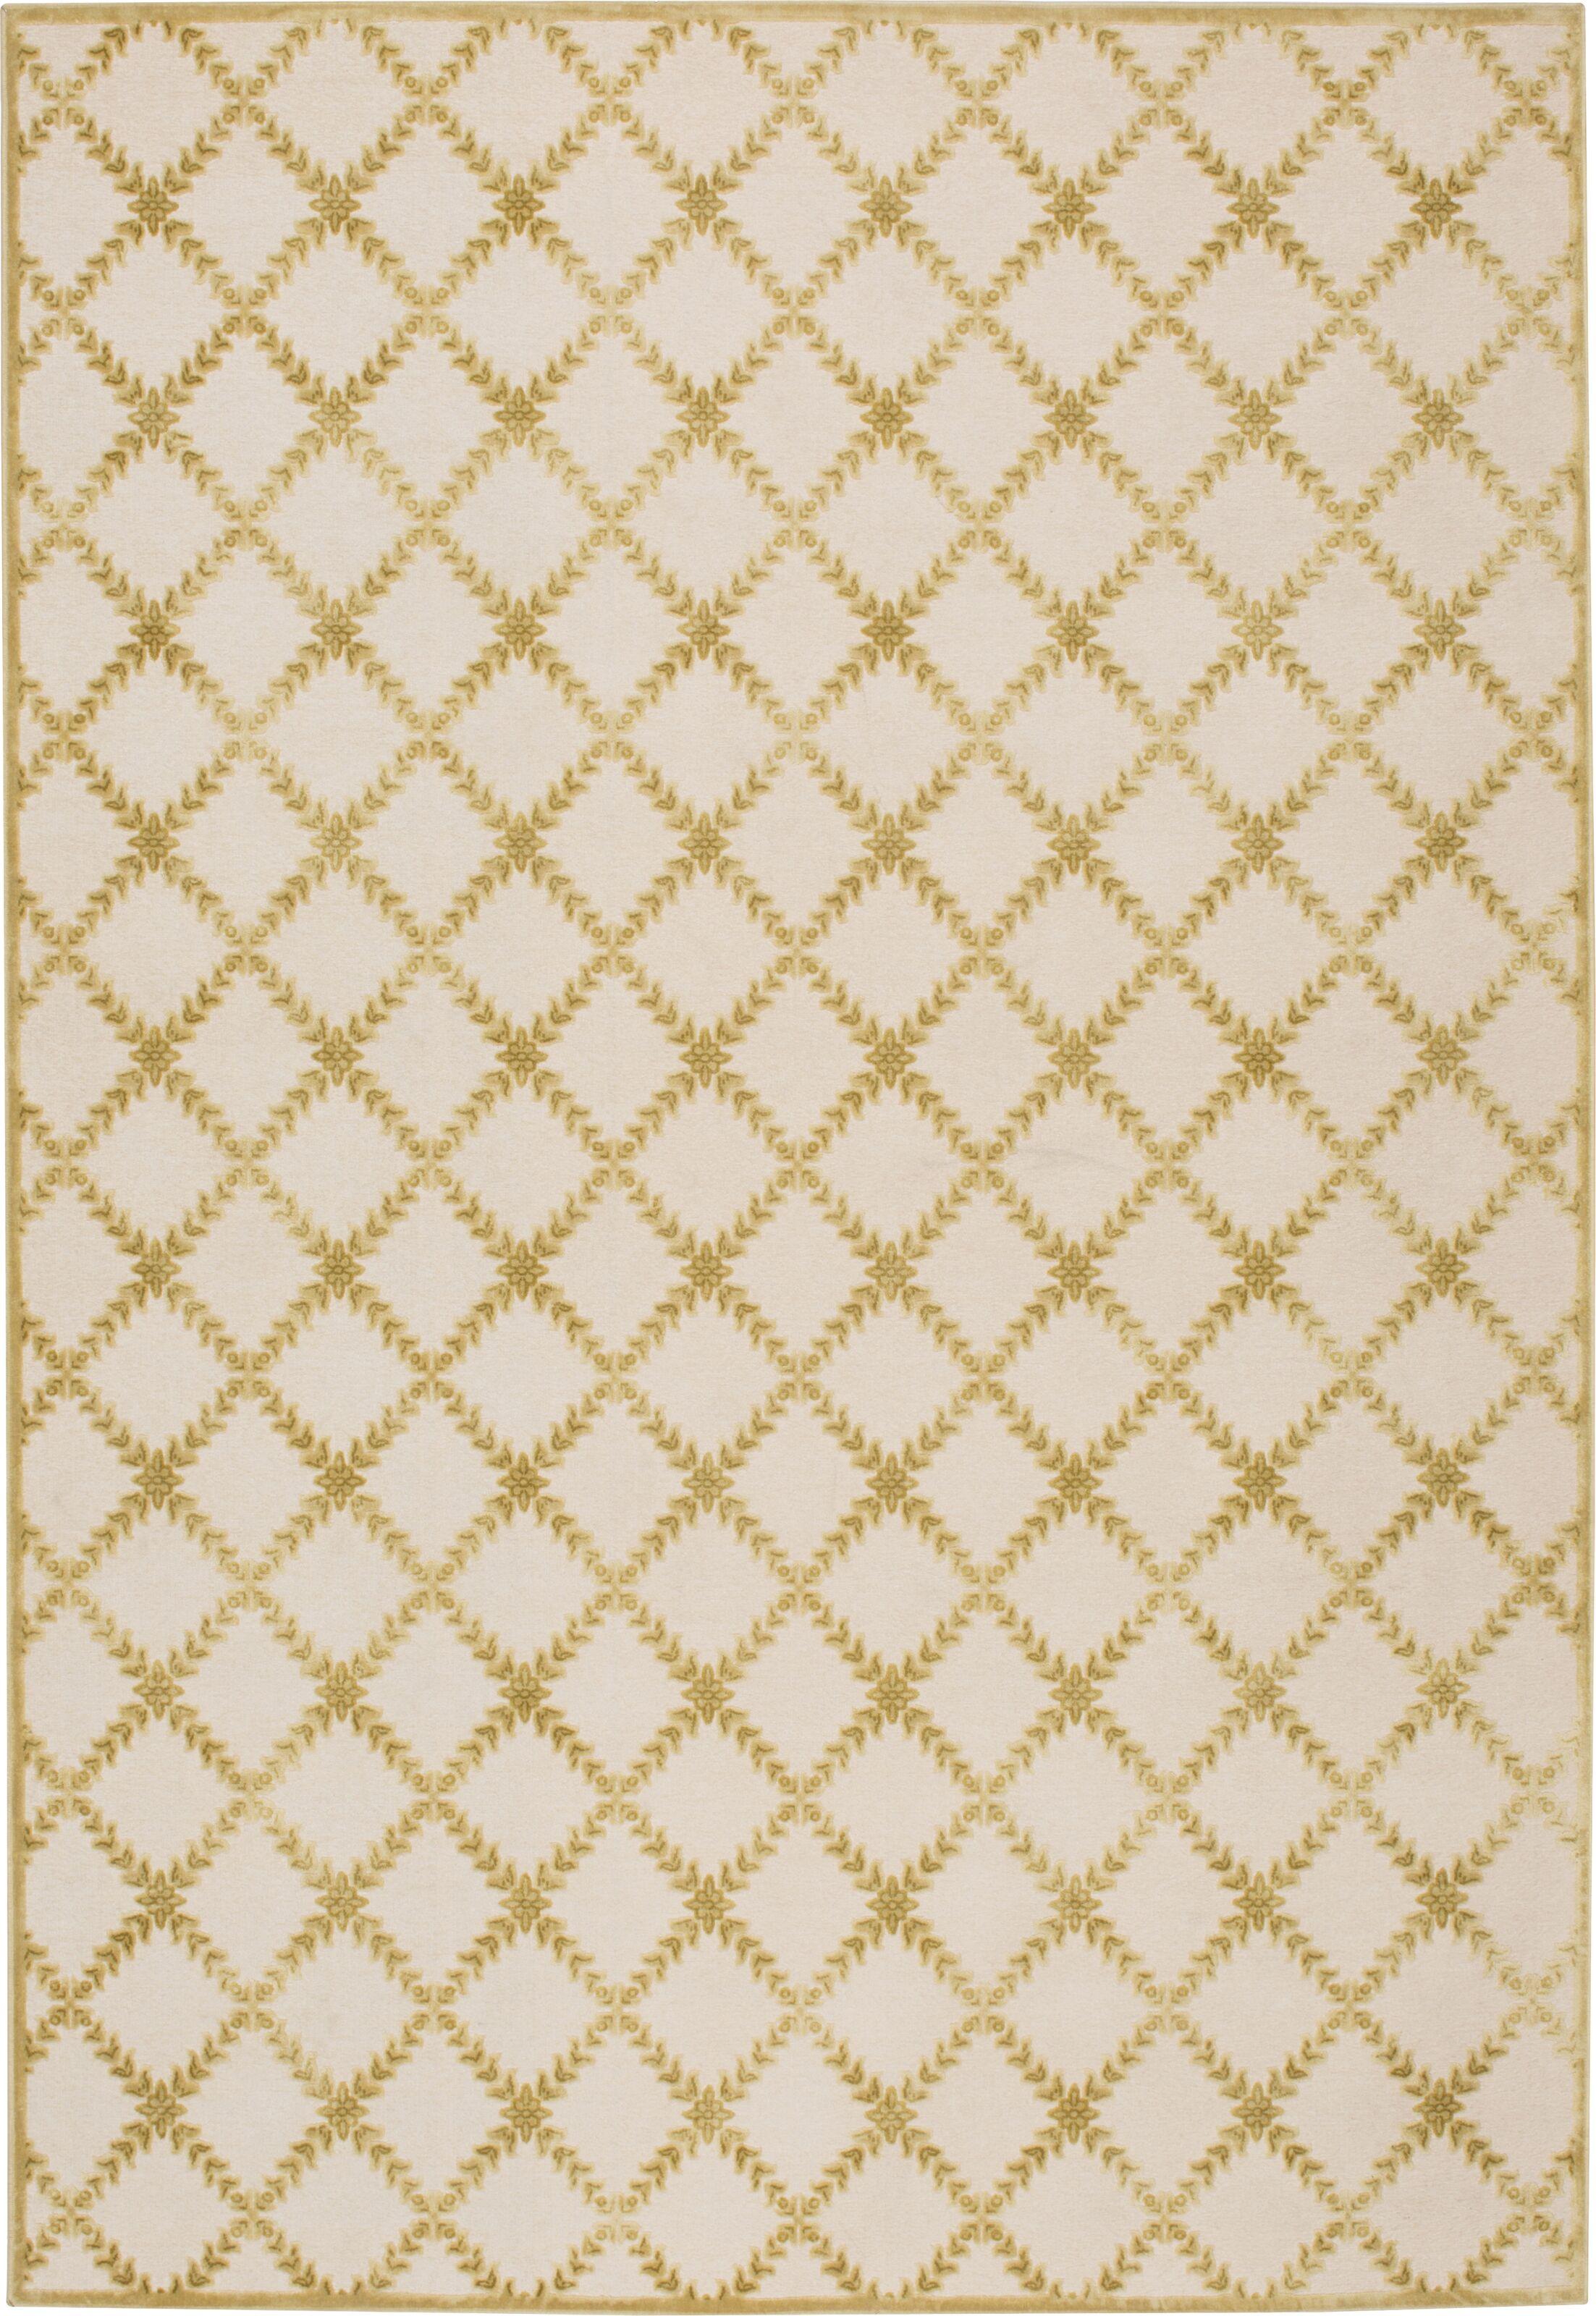 Prioleau Cream/Citrine Area Rug Rug Size: Rectangle 5'3